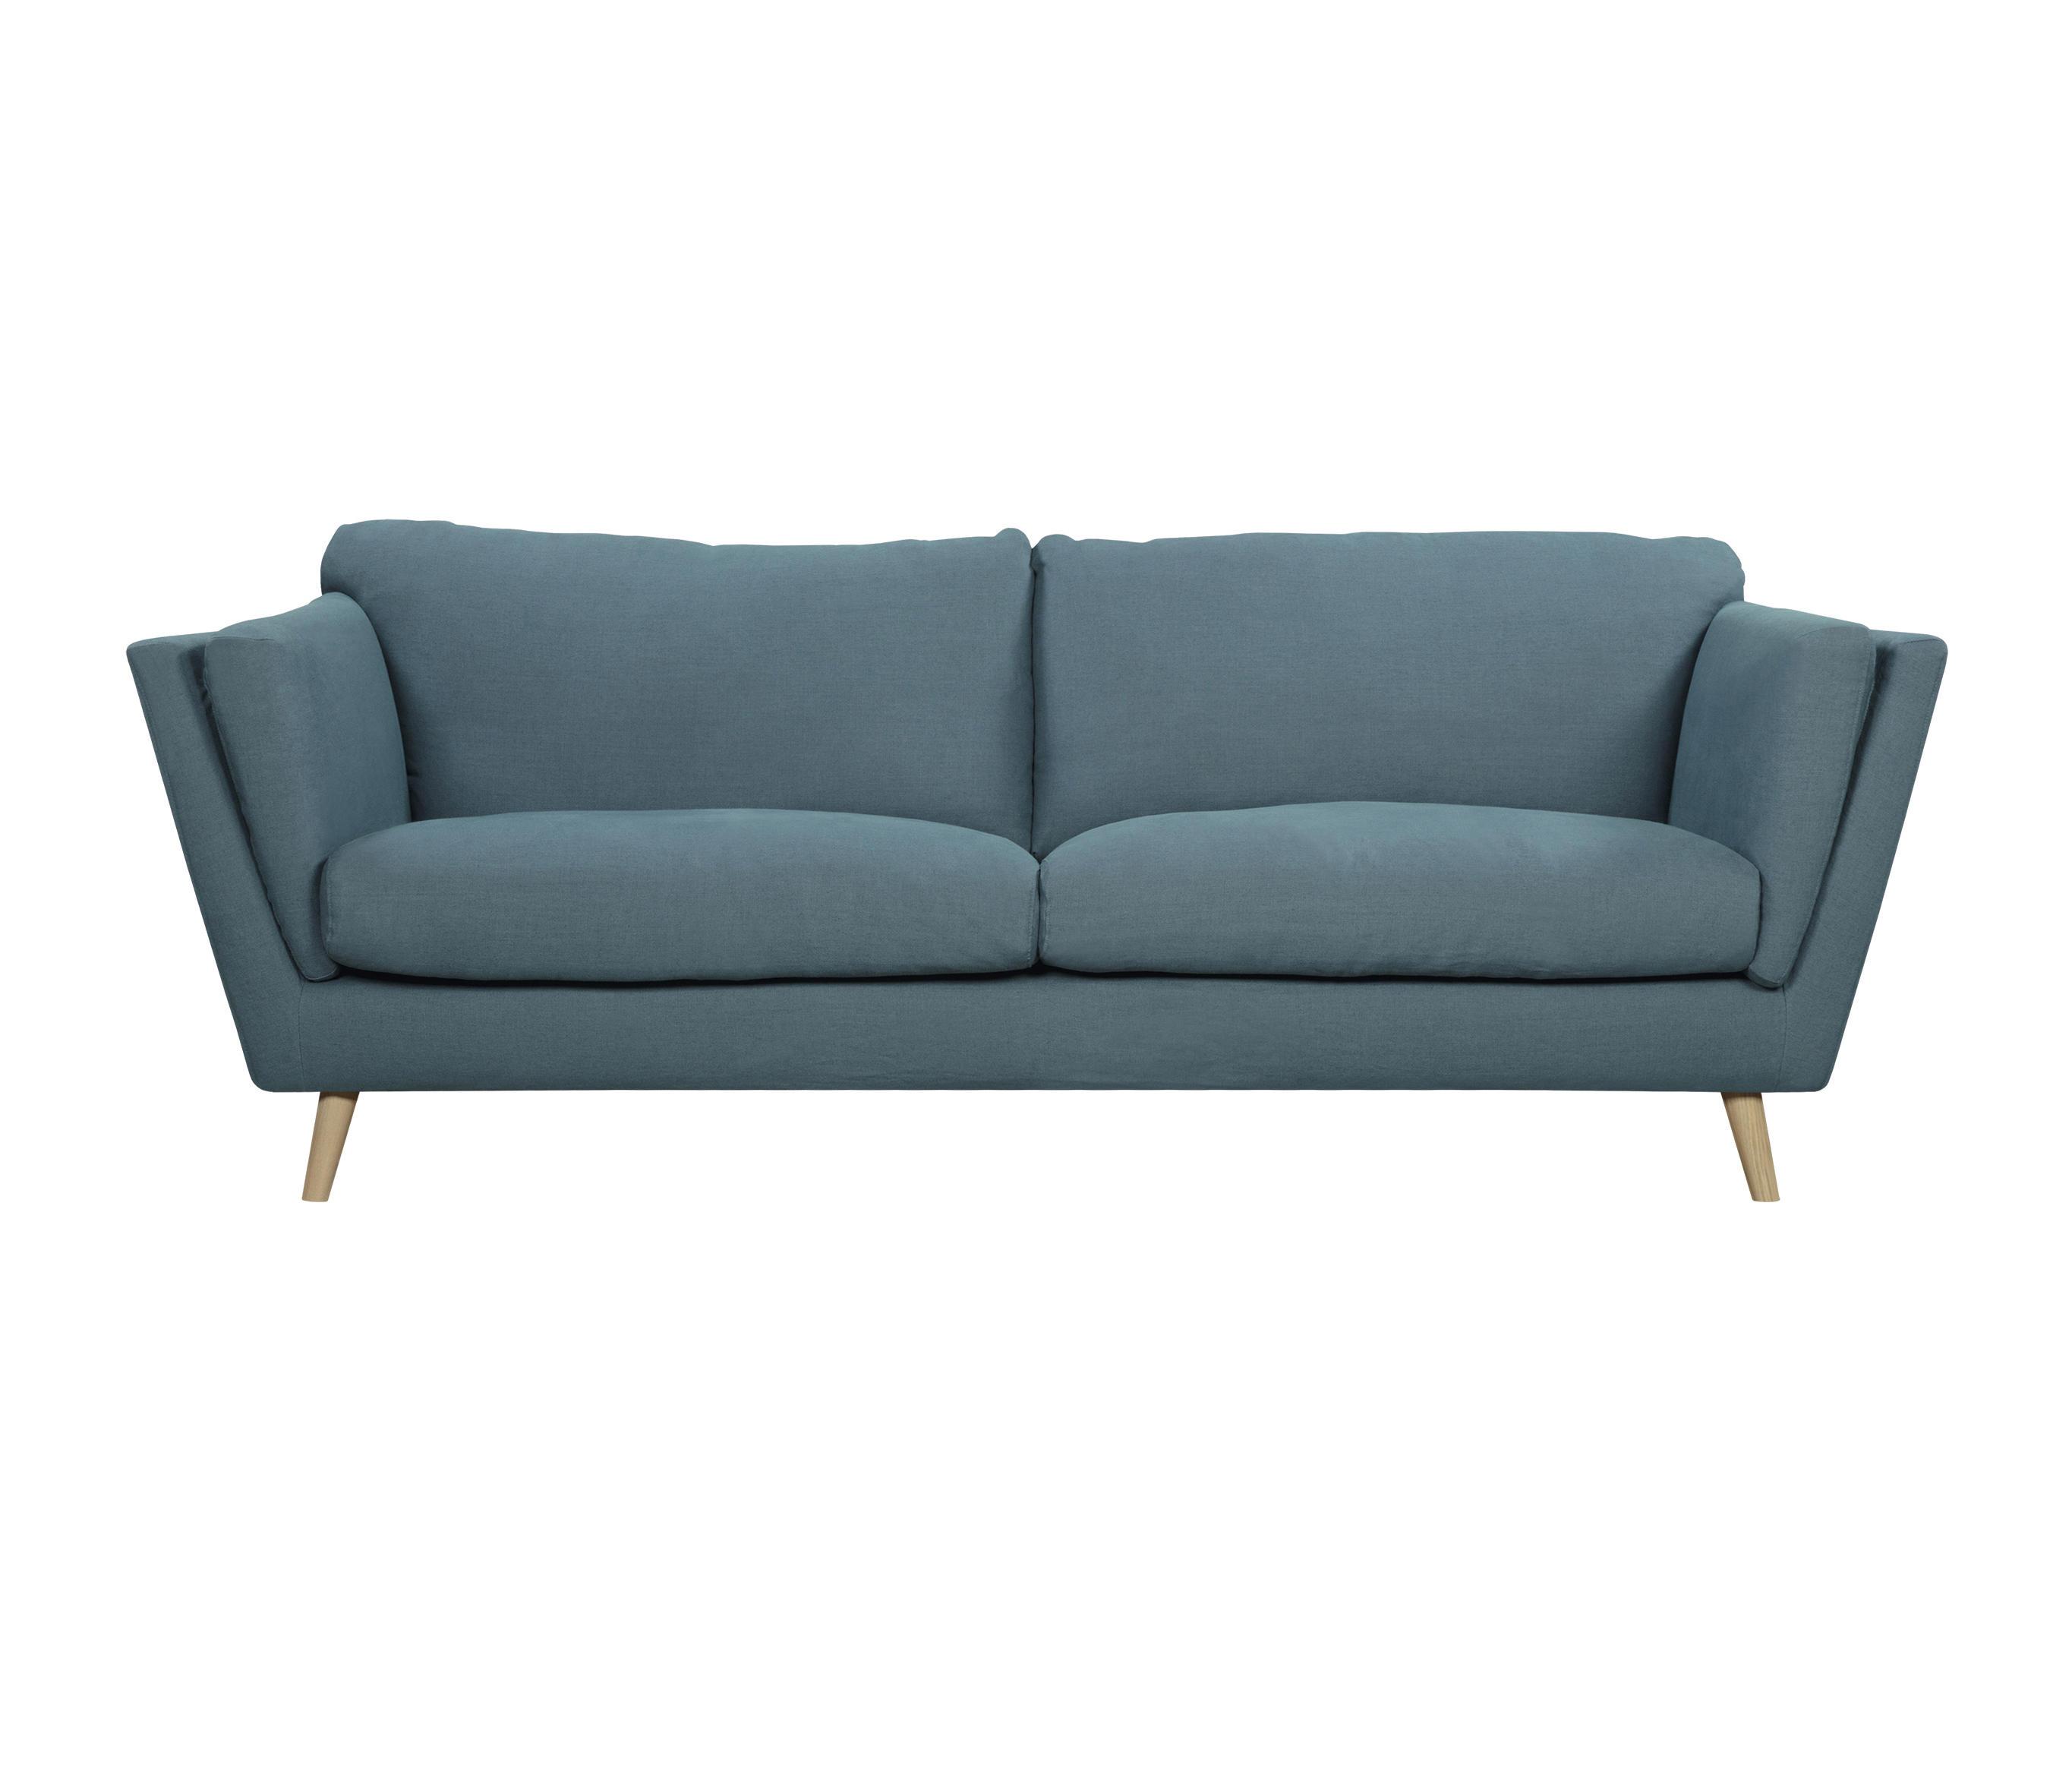 Nova By Sits Sofas